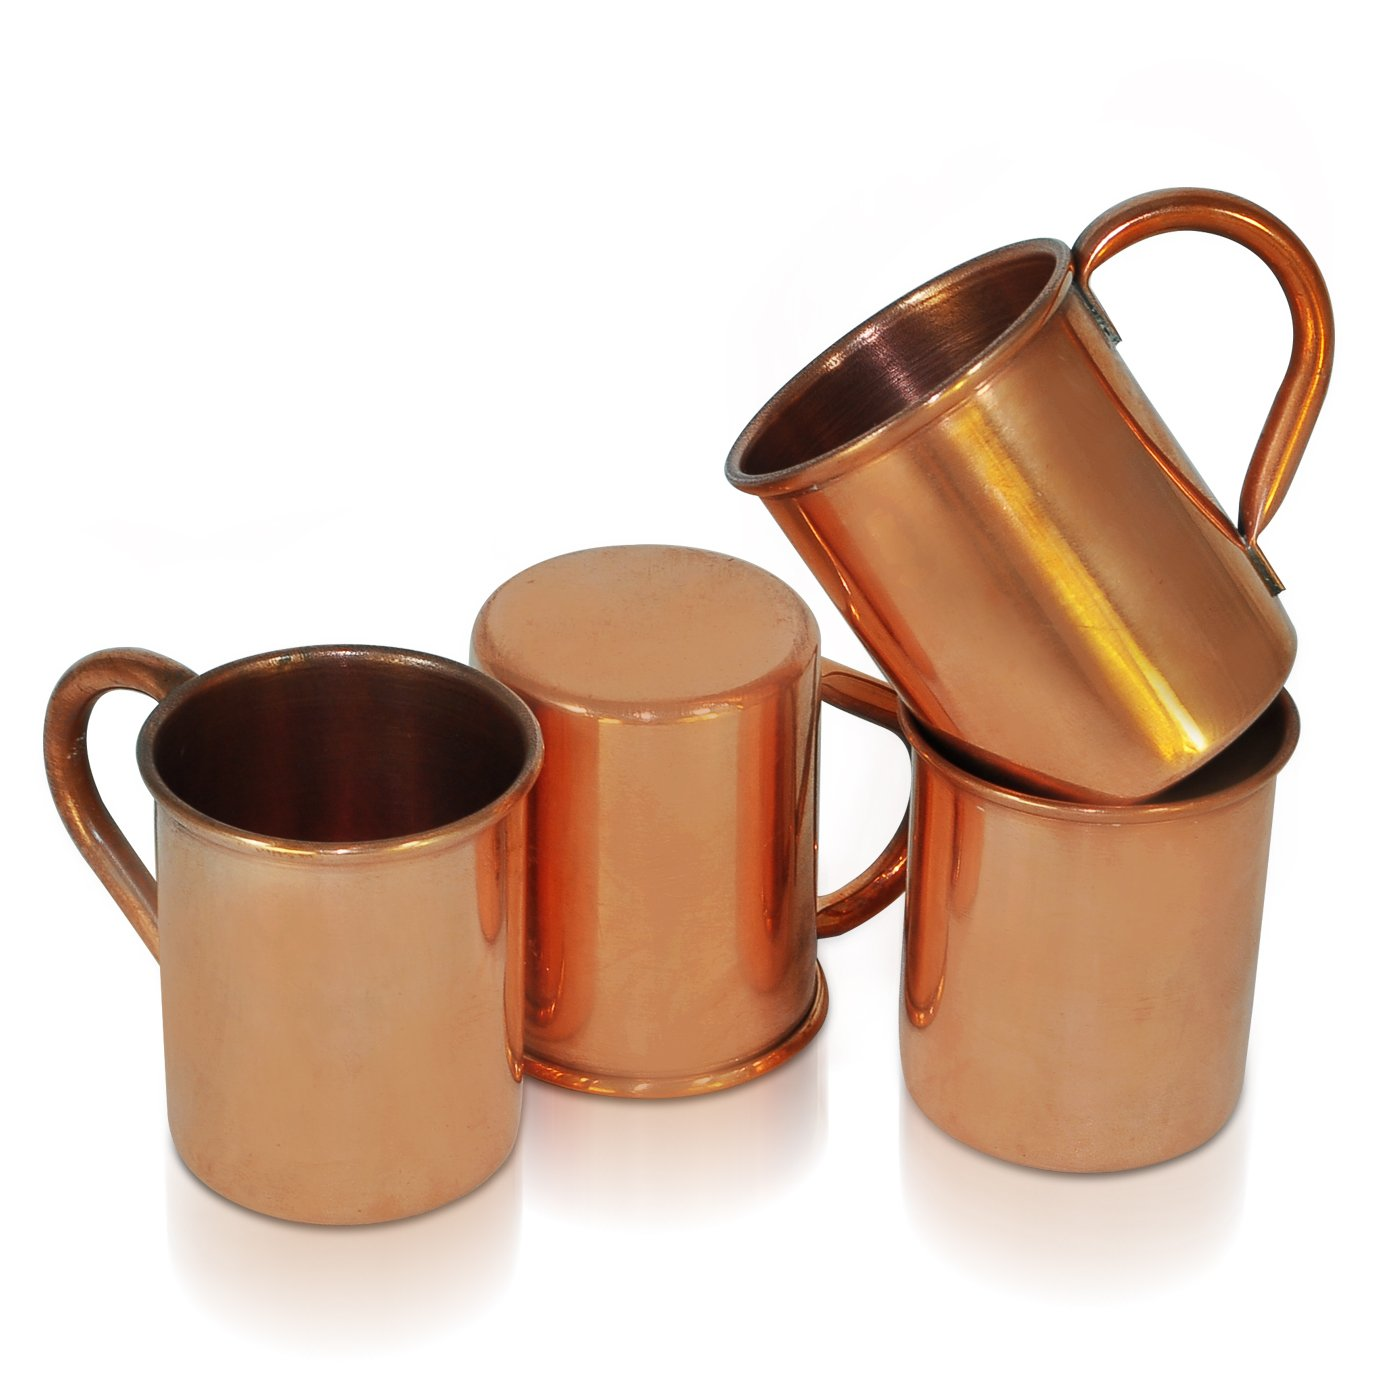 Dungri India Craft 100 % Pure copper Plain SHOT Moscow Mule Mug - ( Capacity- 70 ML / 2.3 oz ) , Set of 16 -Cocktail SHOT MUG